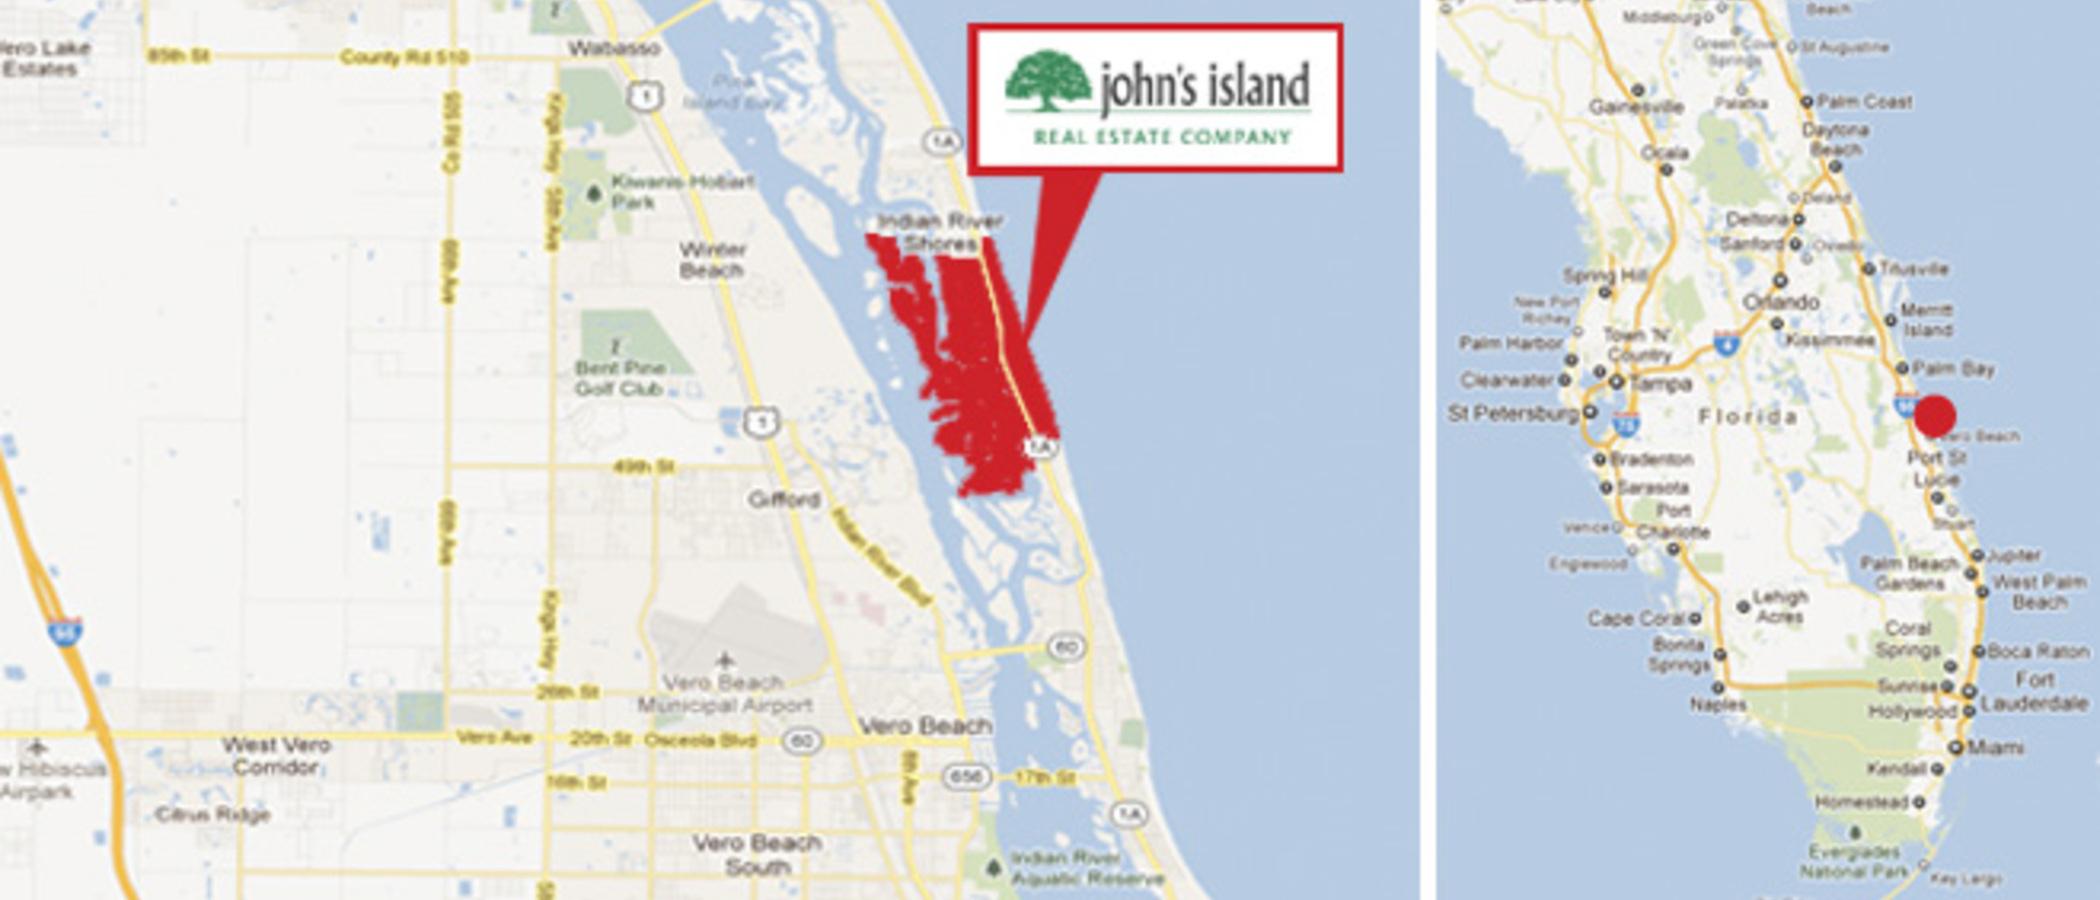 John's Island Real Estate Company